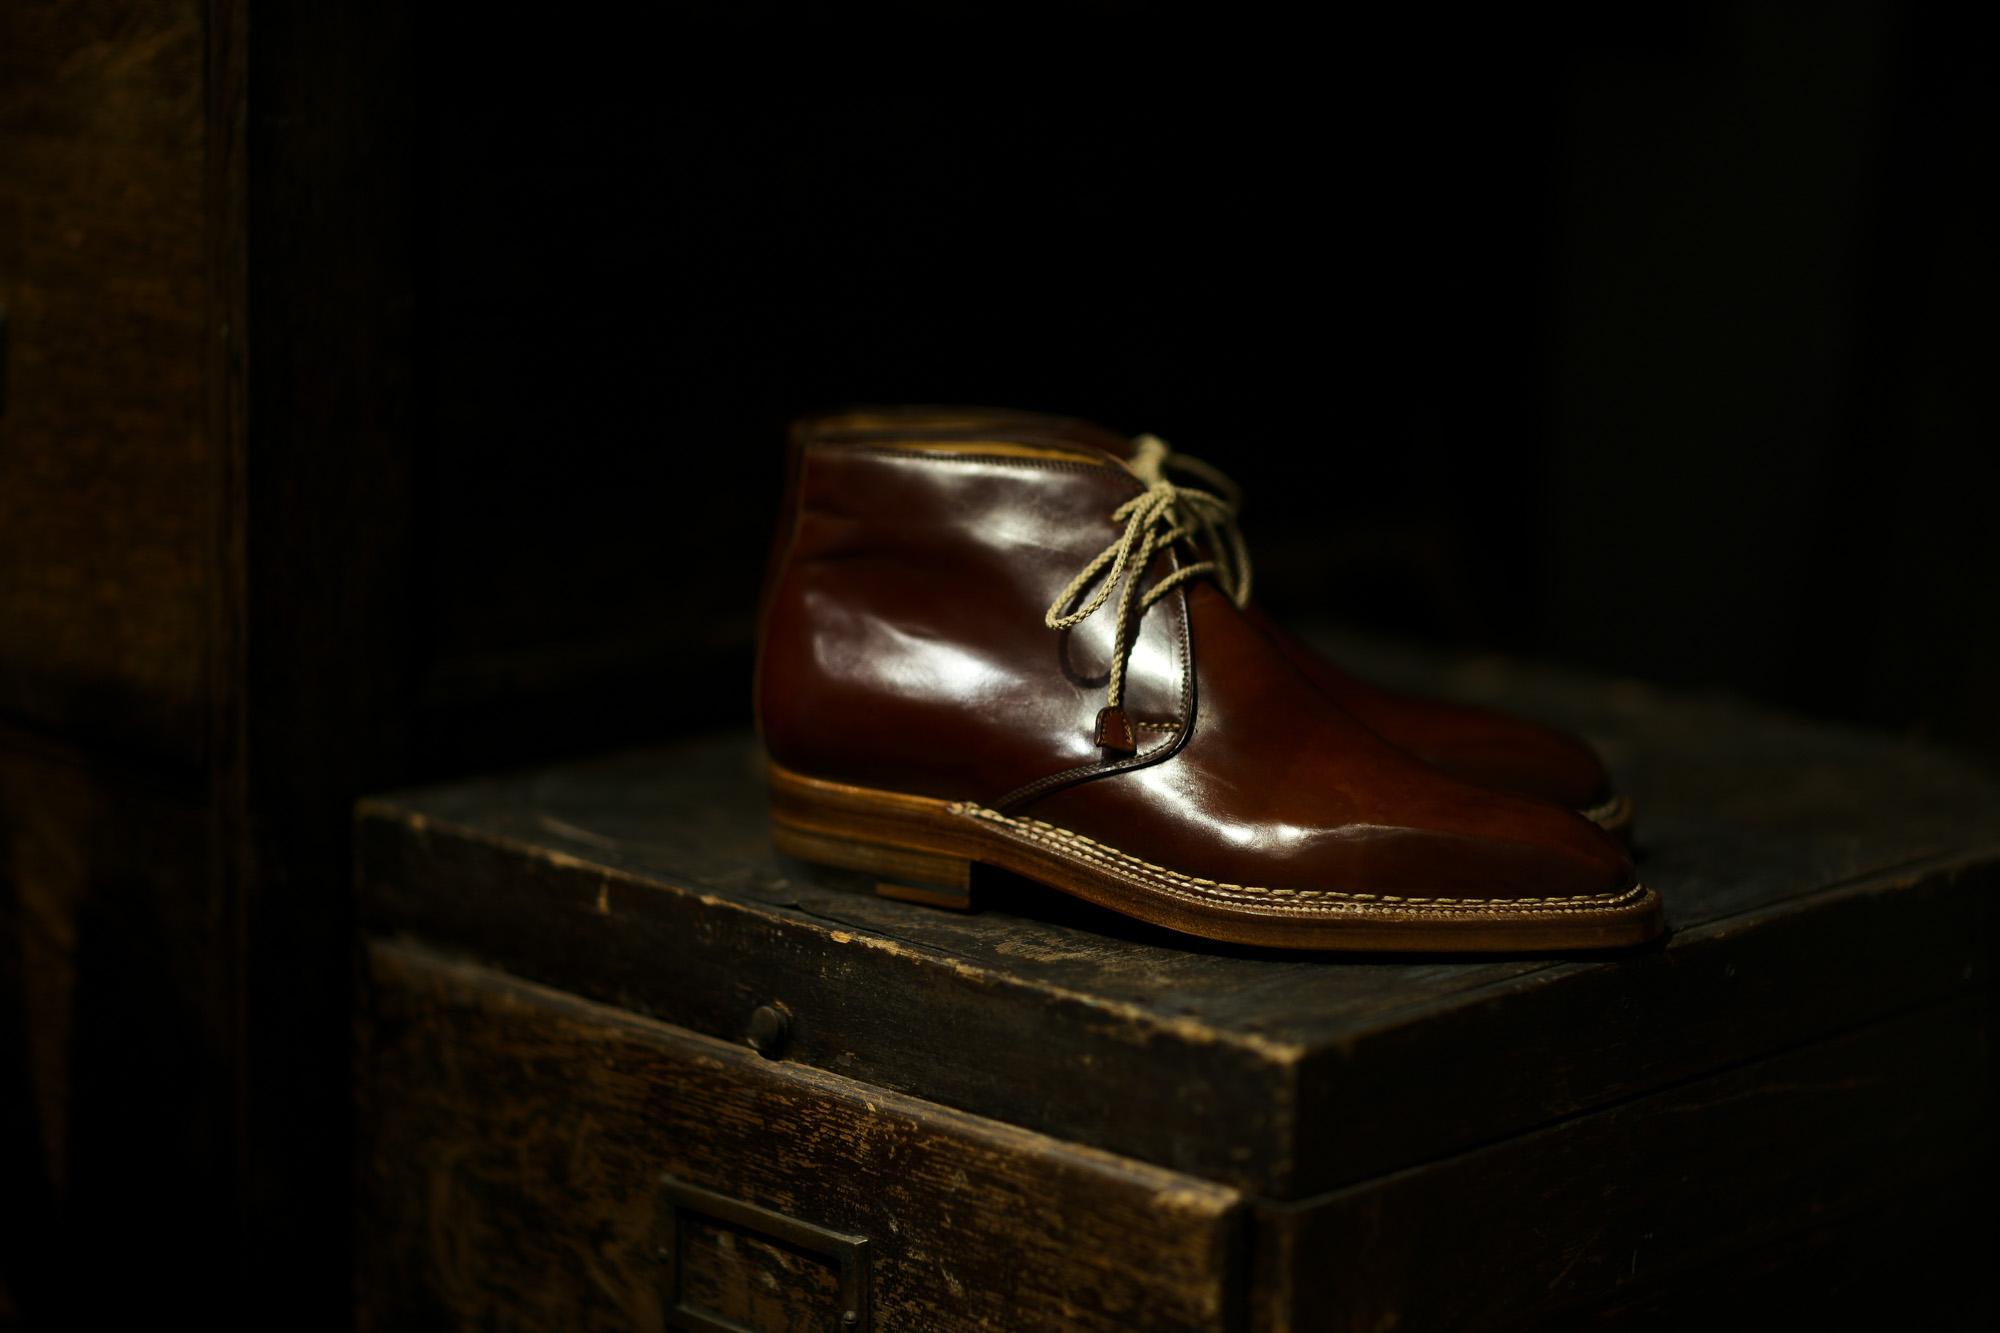 ENZO BONAFE(エンツォボナフェ) ART.3722 Chukka boots チャッカブーツ Horween Shell Cordovan Leather ホーウィン社 シェルコードバンレザー ノルベジェーゼ製法 チャッカブーツ コードバンブーツ No.4(#4)  made in italy (イタリア製) 2019 秋冬 enzobonafe 愛知 名古屋 altoediritto アルトエデリット